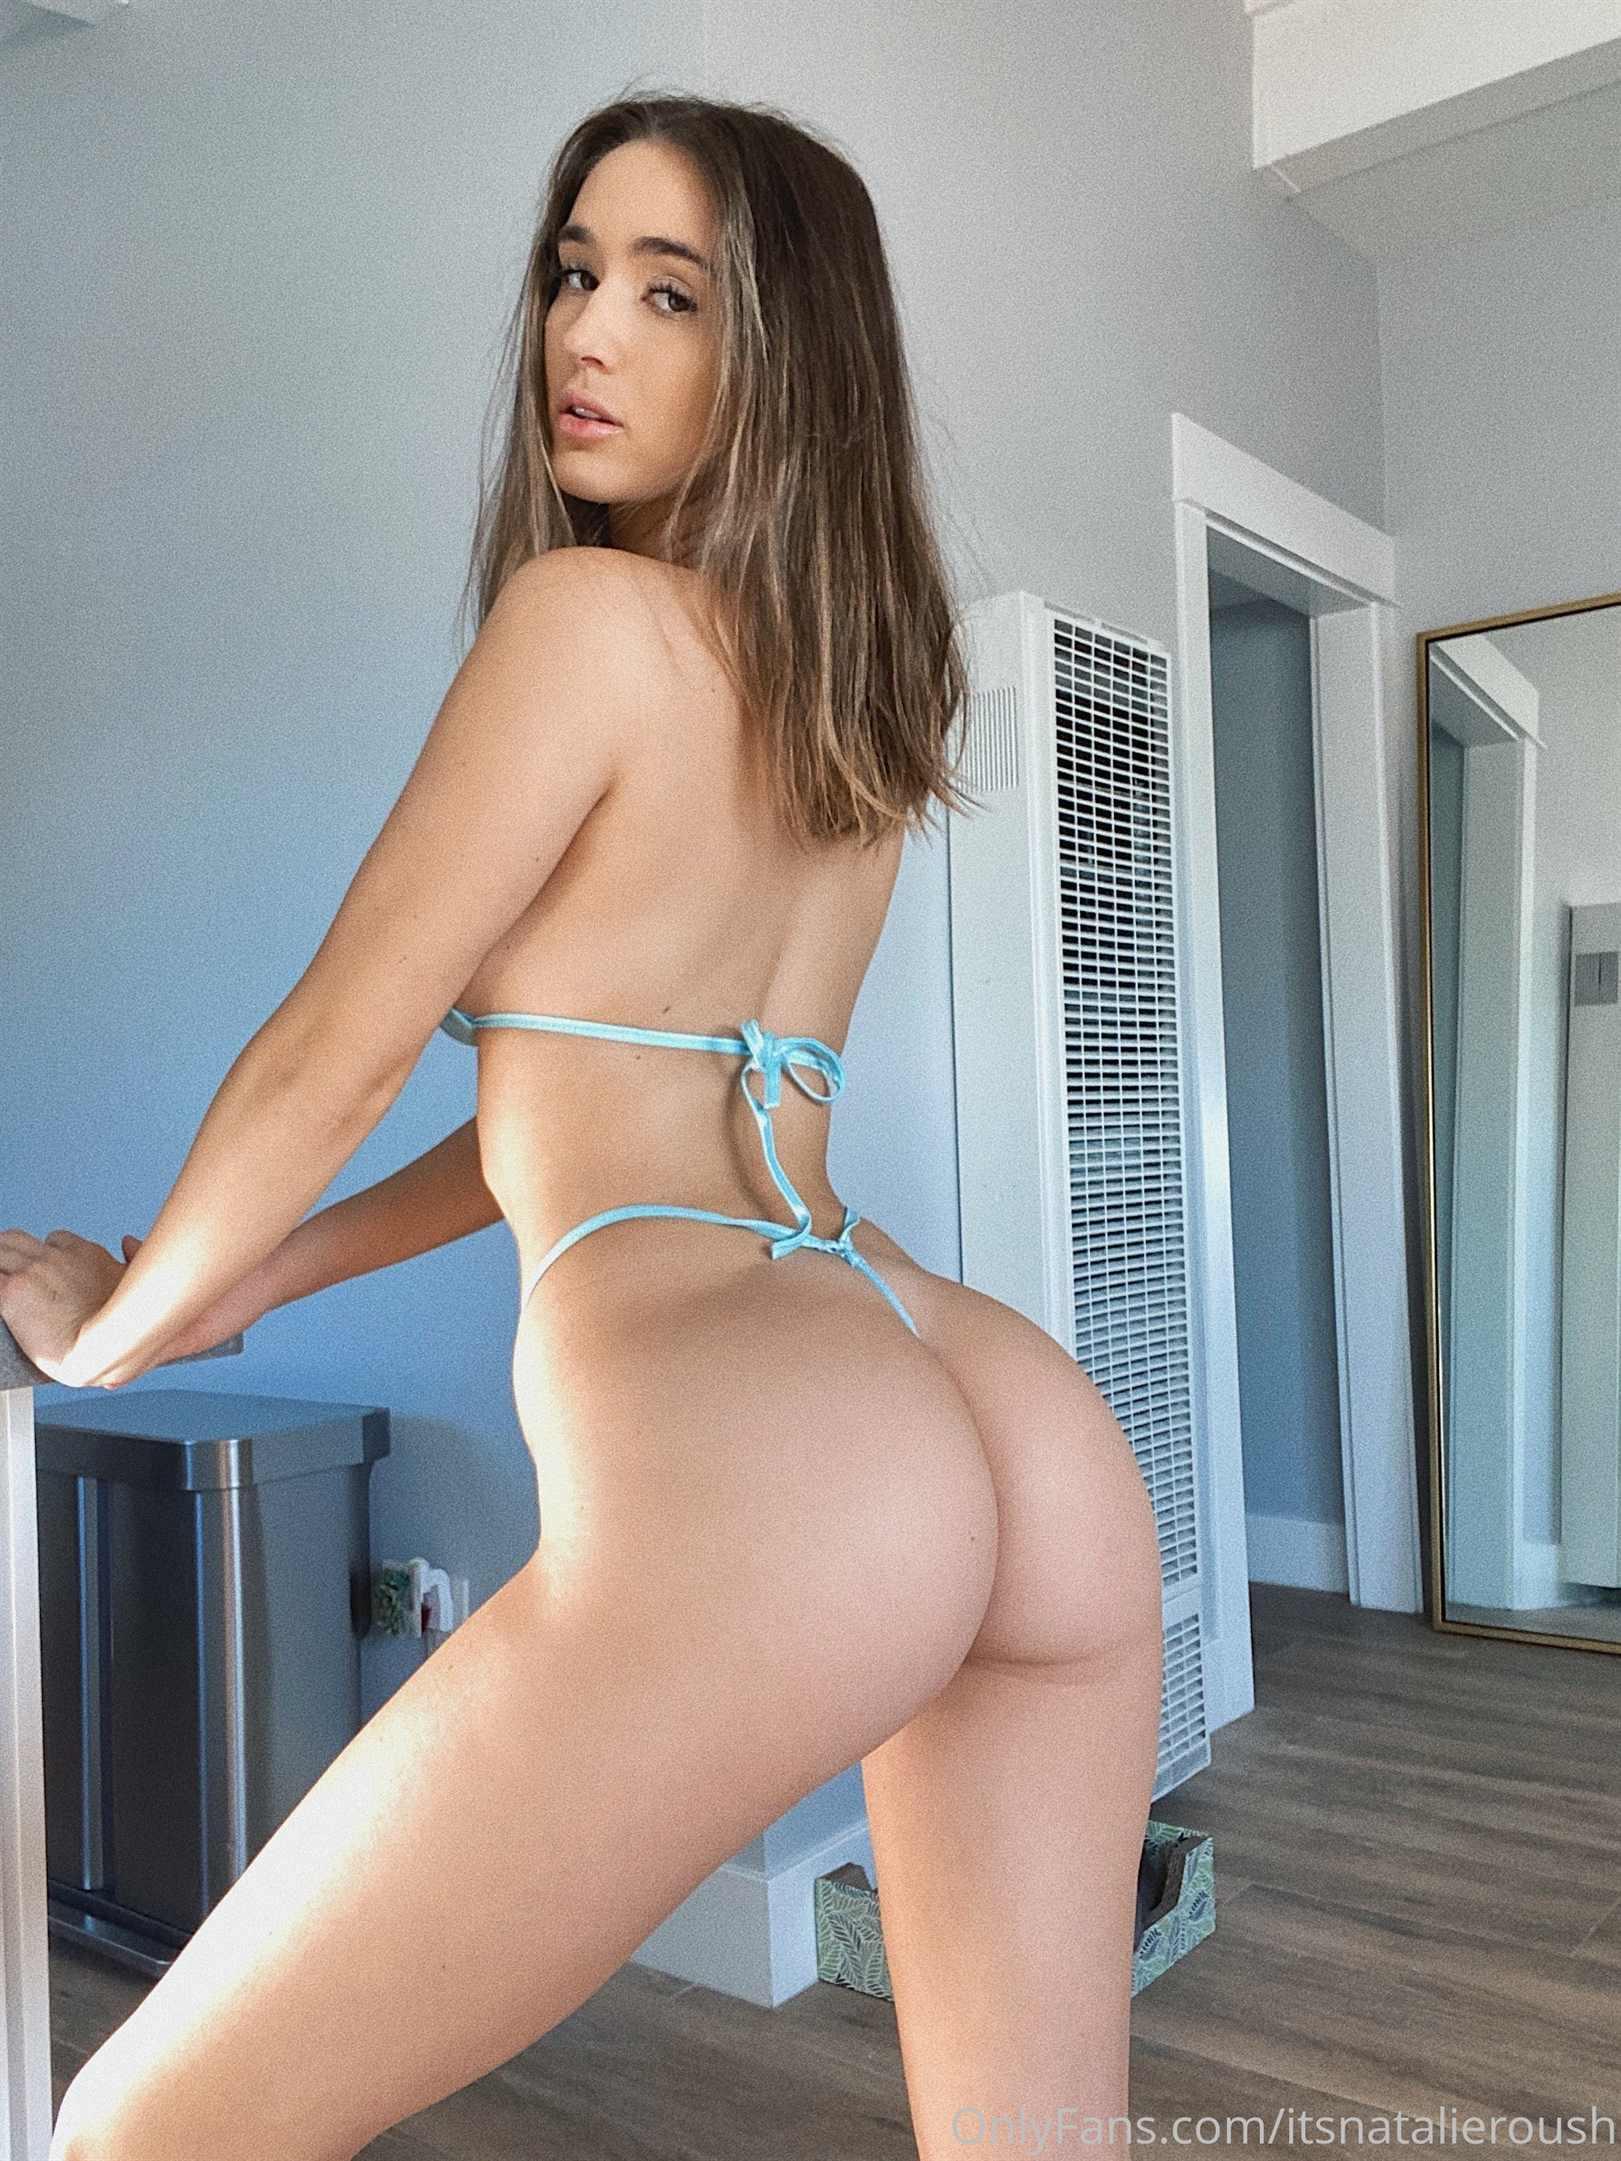 Natalie Roush Micro Bikini Try Nude Leaked 0002